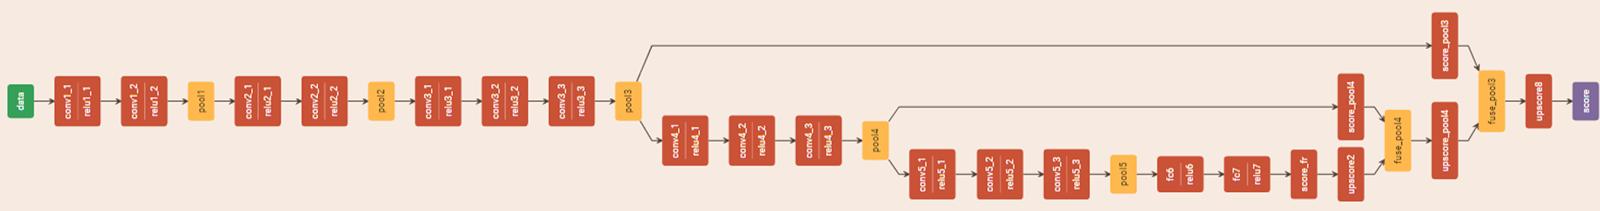 Figure 4. A sample VGG16-based fully convolutional network trained for semantic segmentation.